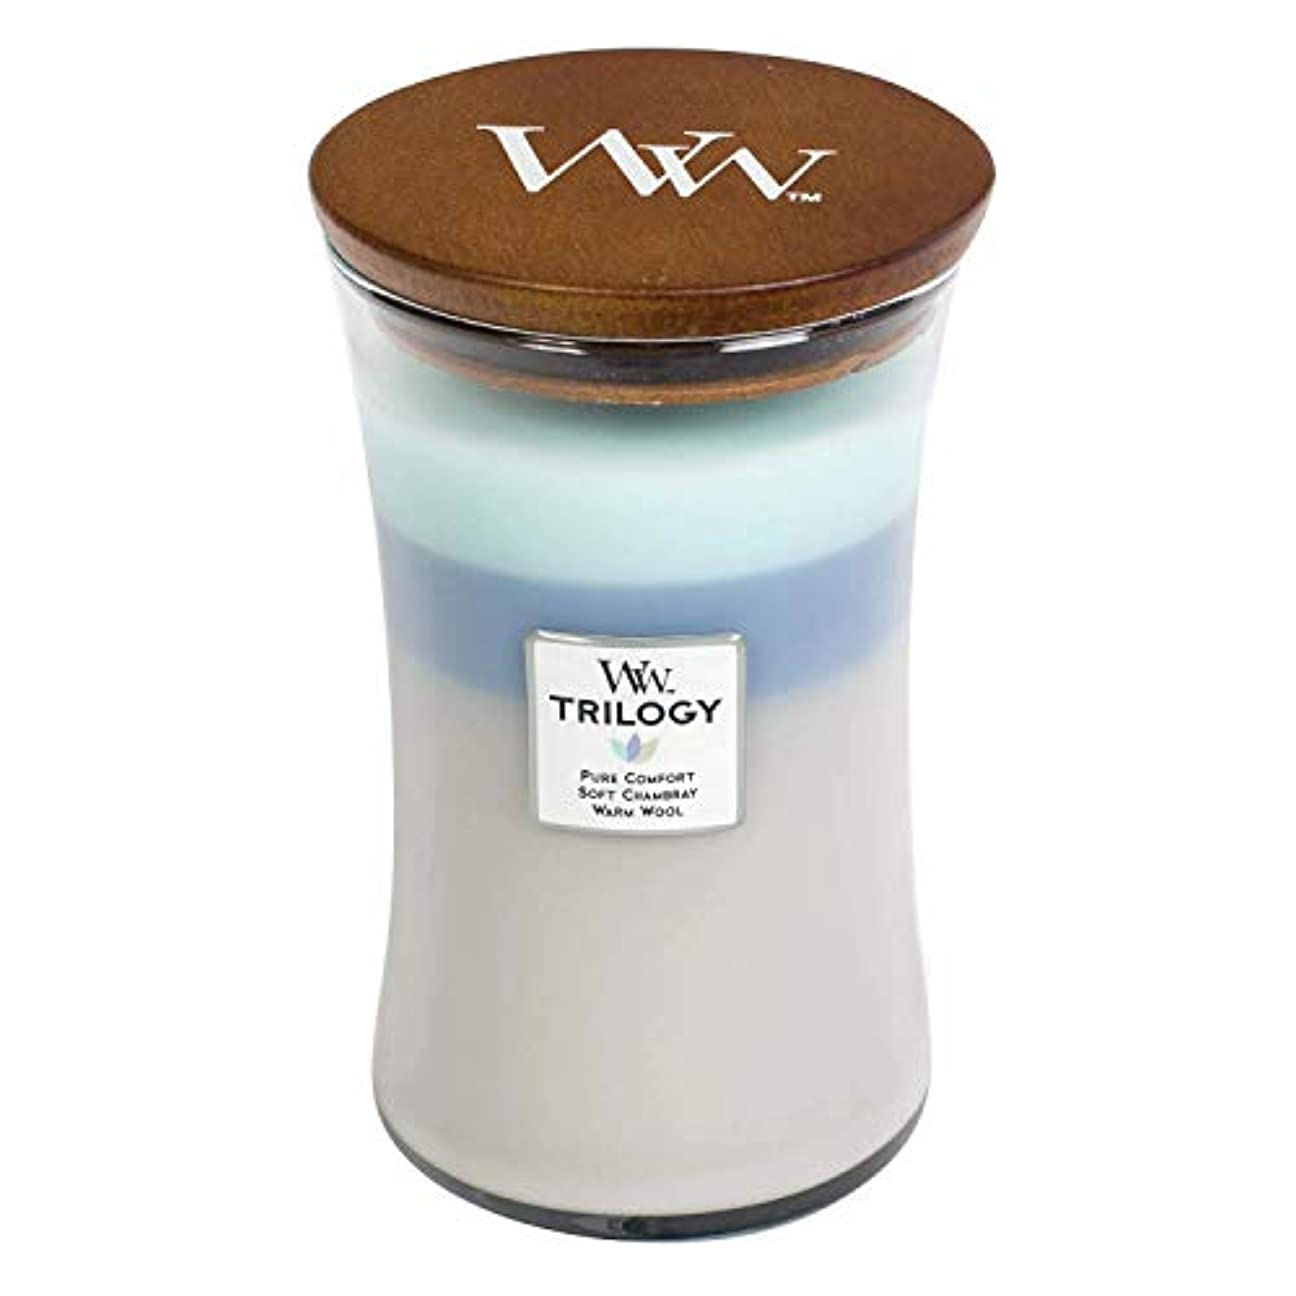 Woven Comforts WoodWick Trilogy 22オンス香りつきJarキャンドル – 3 in 1つ